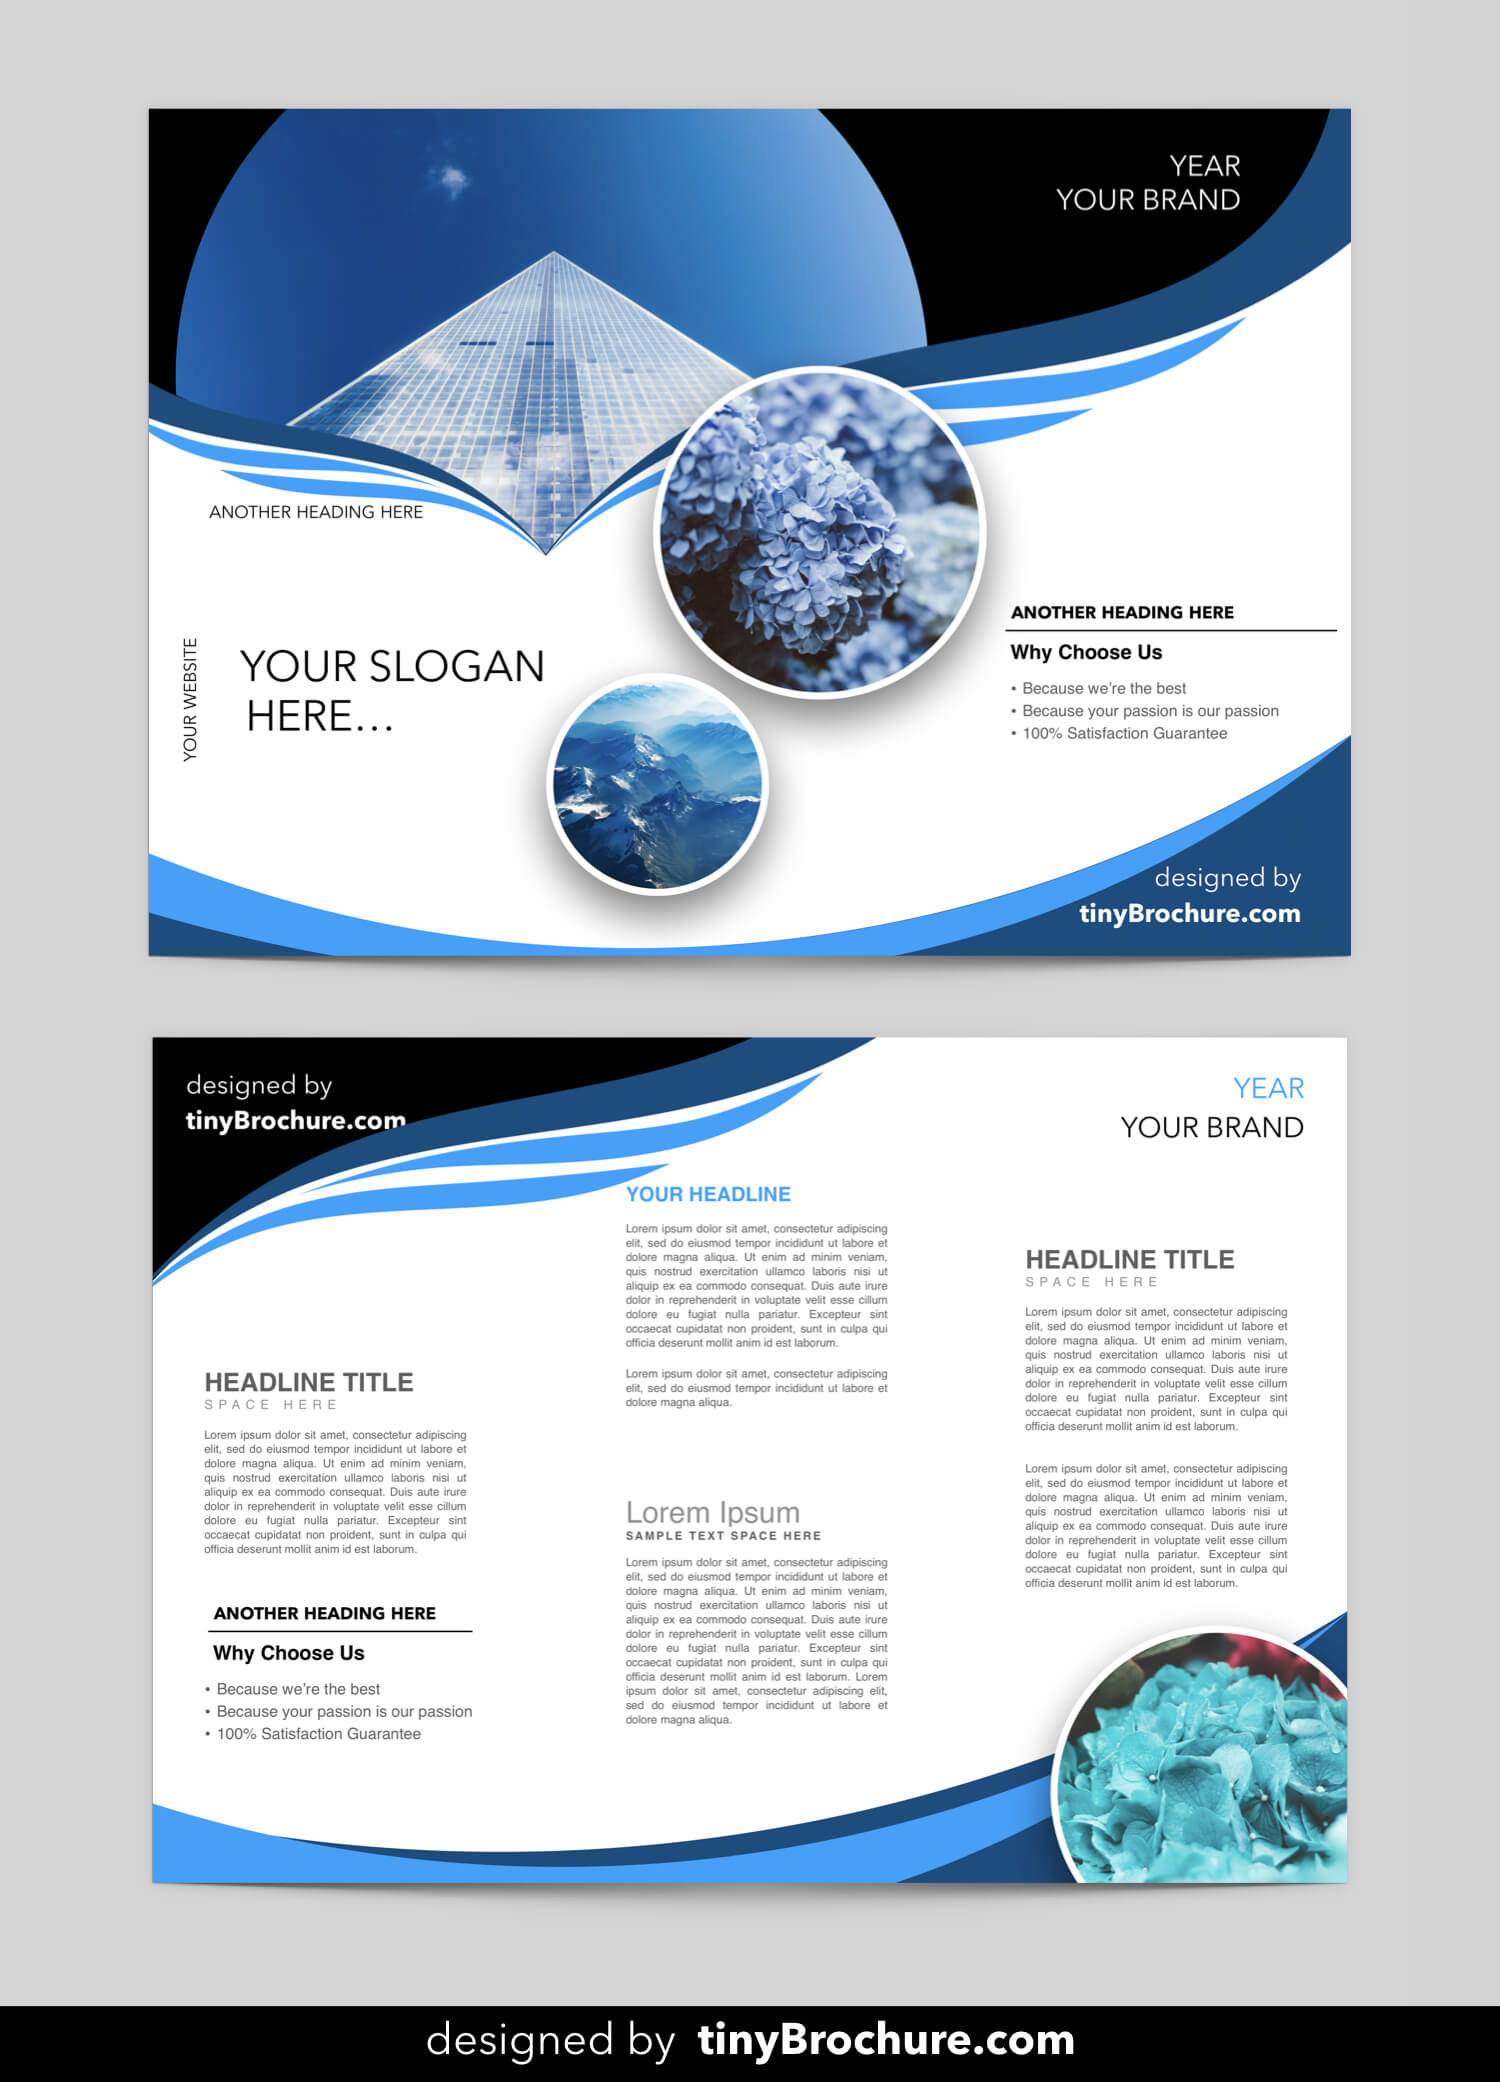 Editable Brochure Template Word Free Download | Brochure With Regard To Word Travel Brochure Template